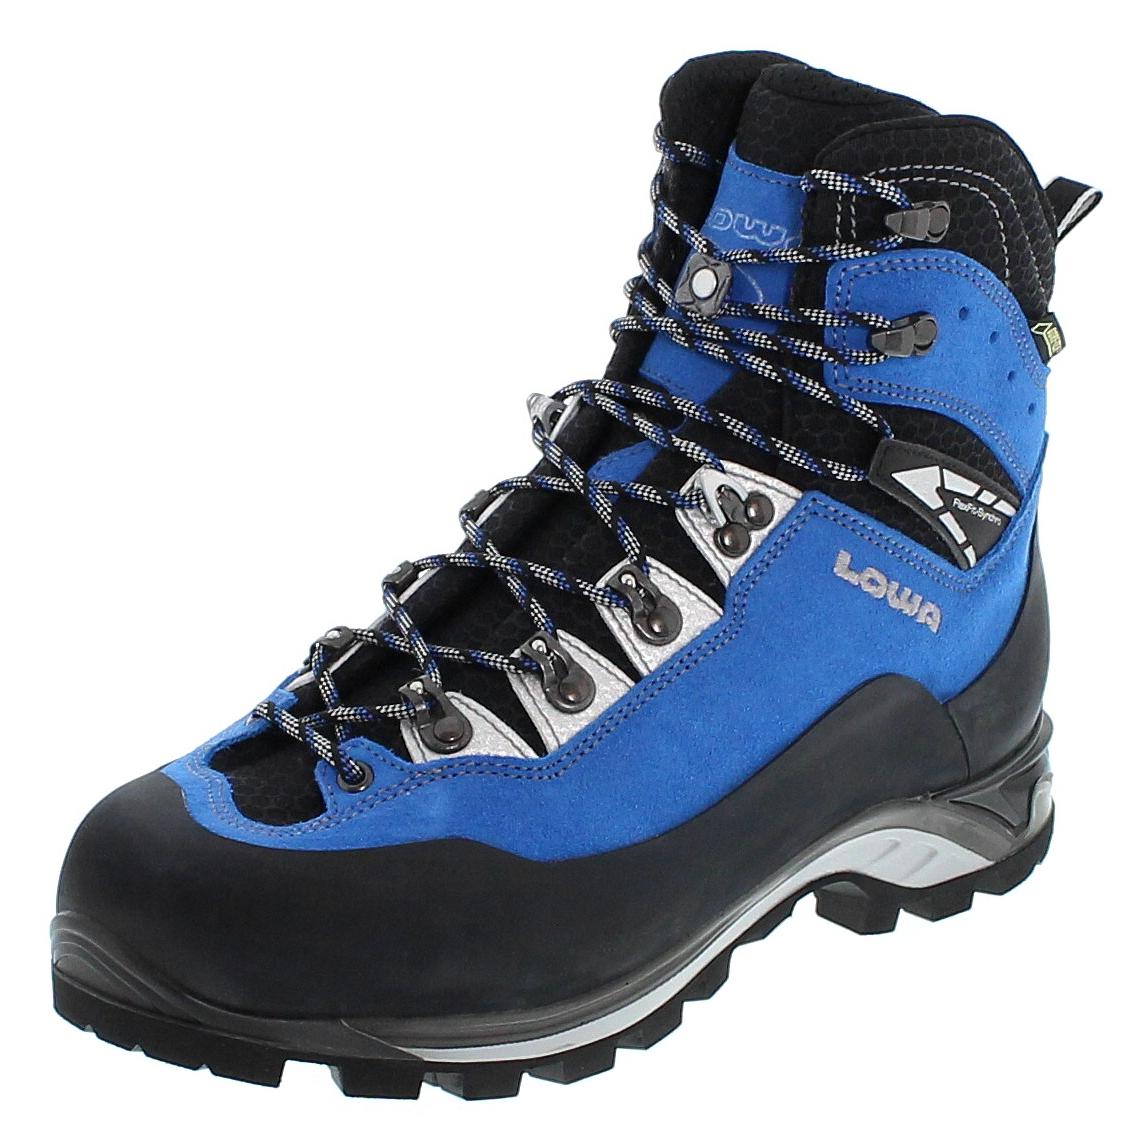 lowa-cevedale-pro-gtx-blau-schwarz-herren-alpin-stiefel